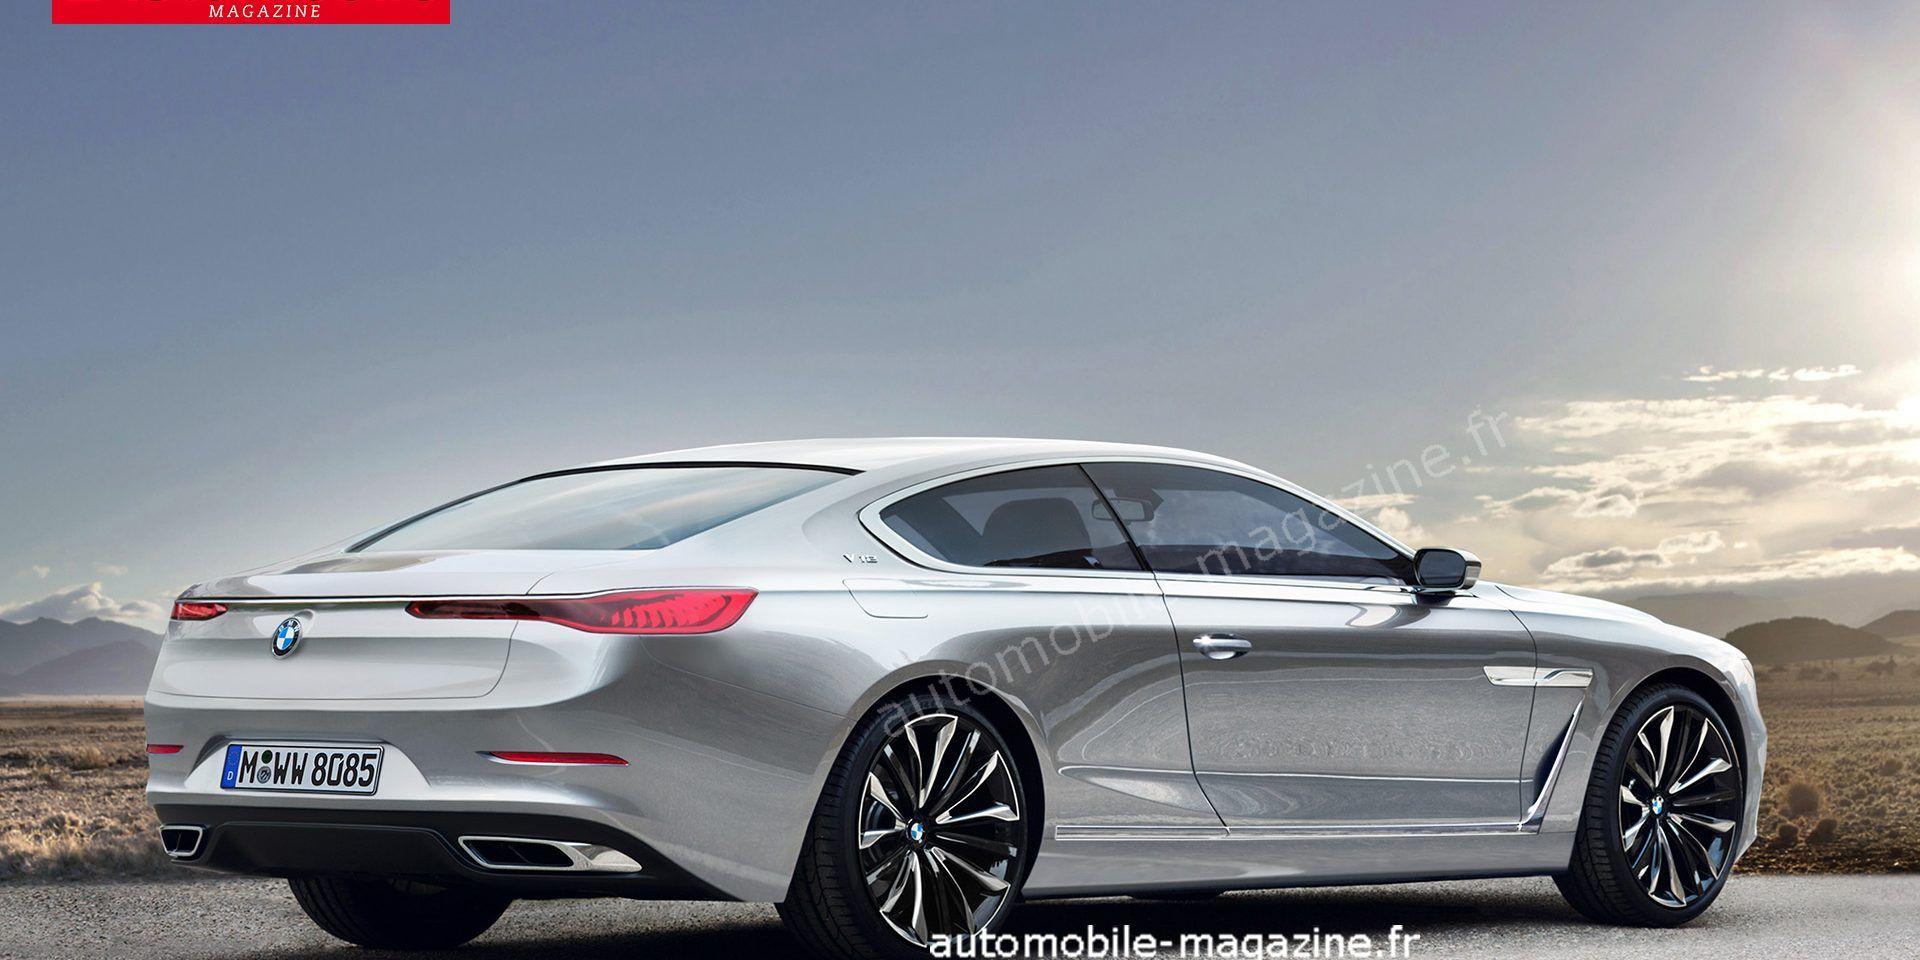 Bmw 8 Series Cabrio Render 2019 2020 Car Renders Pinterest Bmw And Cars